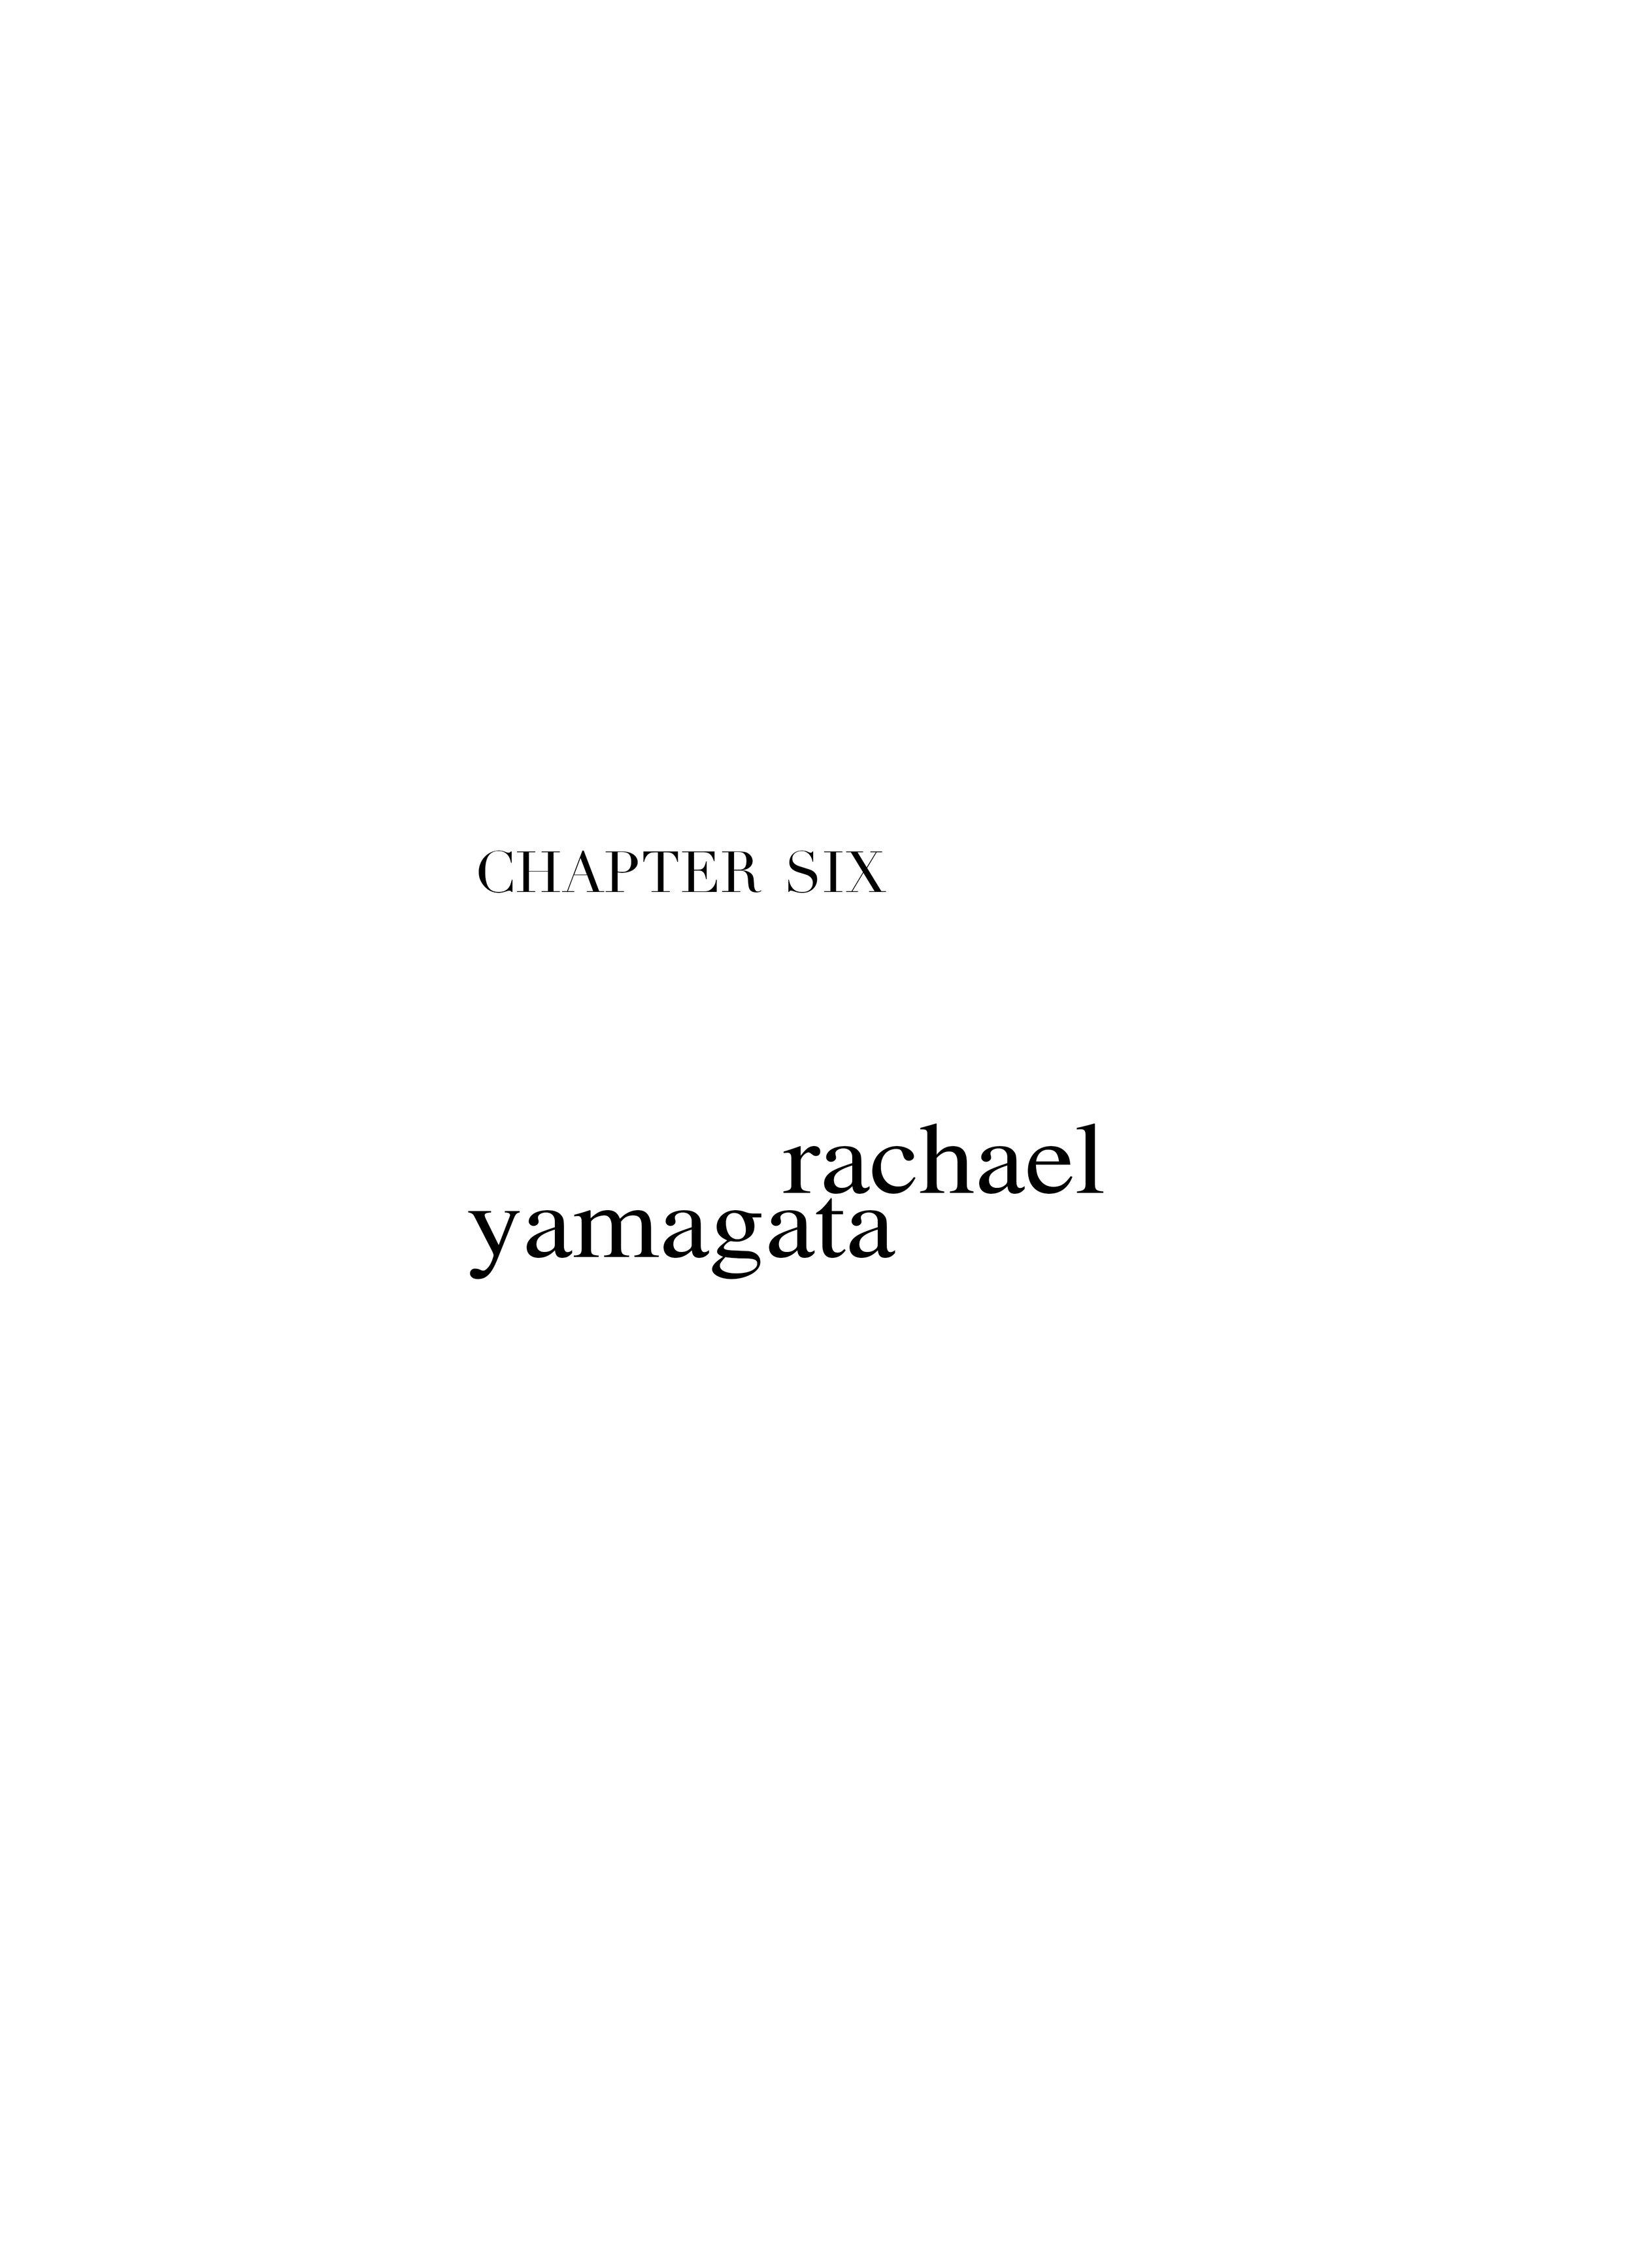 chapter06rachaelyamagata.jpg